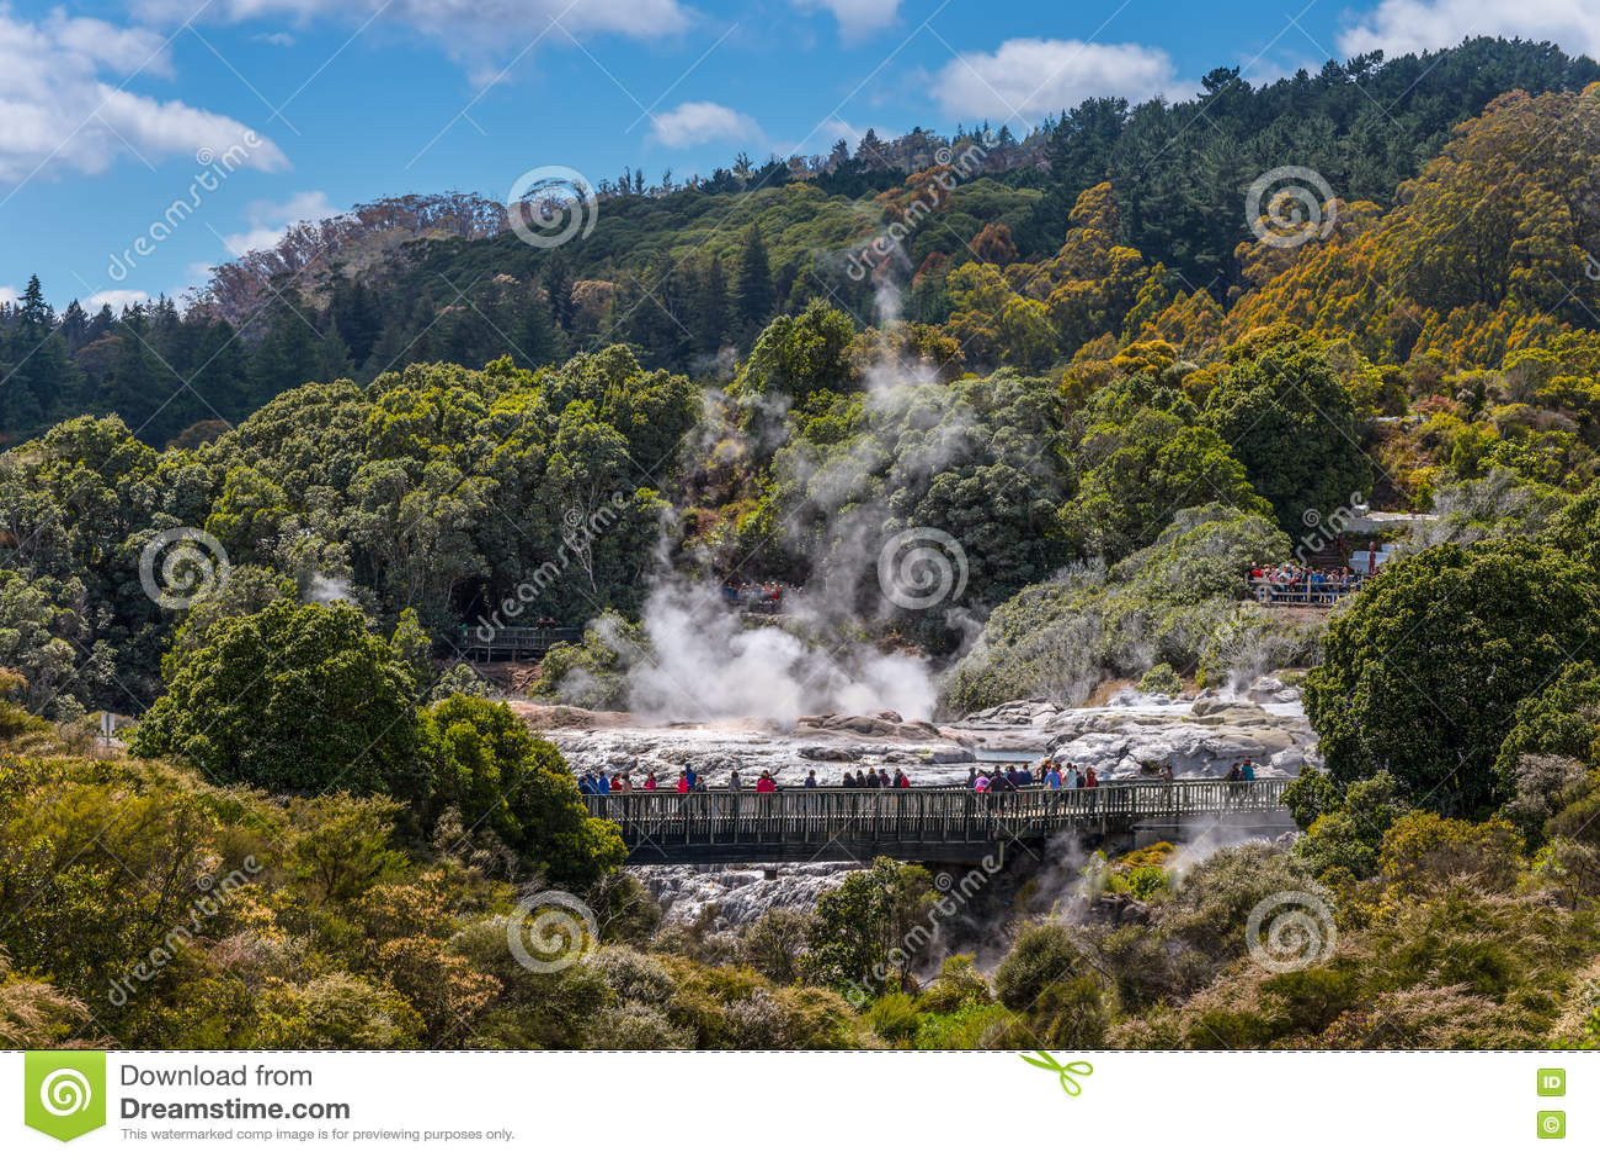 People watching Pohutu Geyser in Rotorua, New Zealand